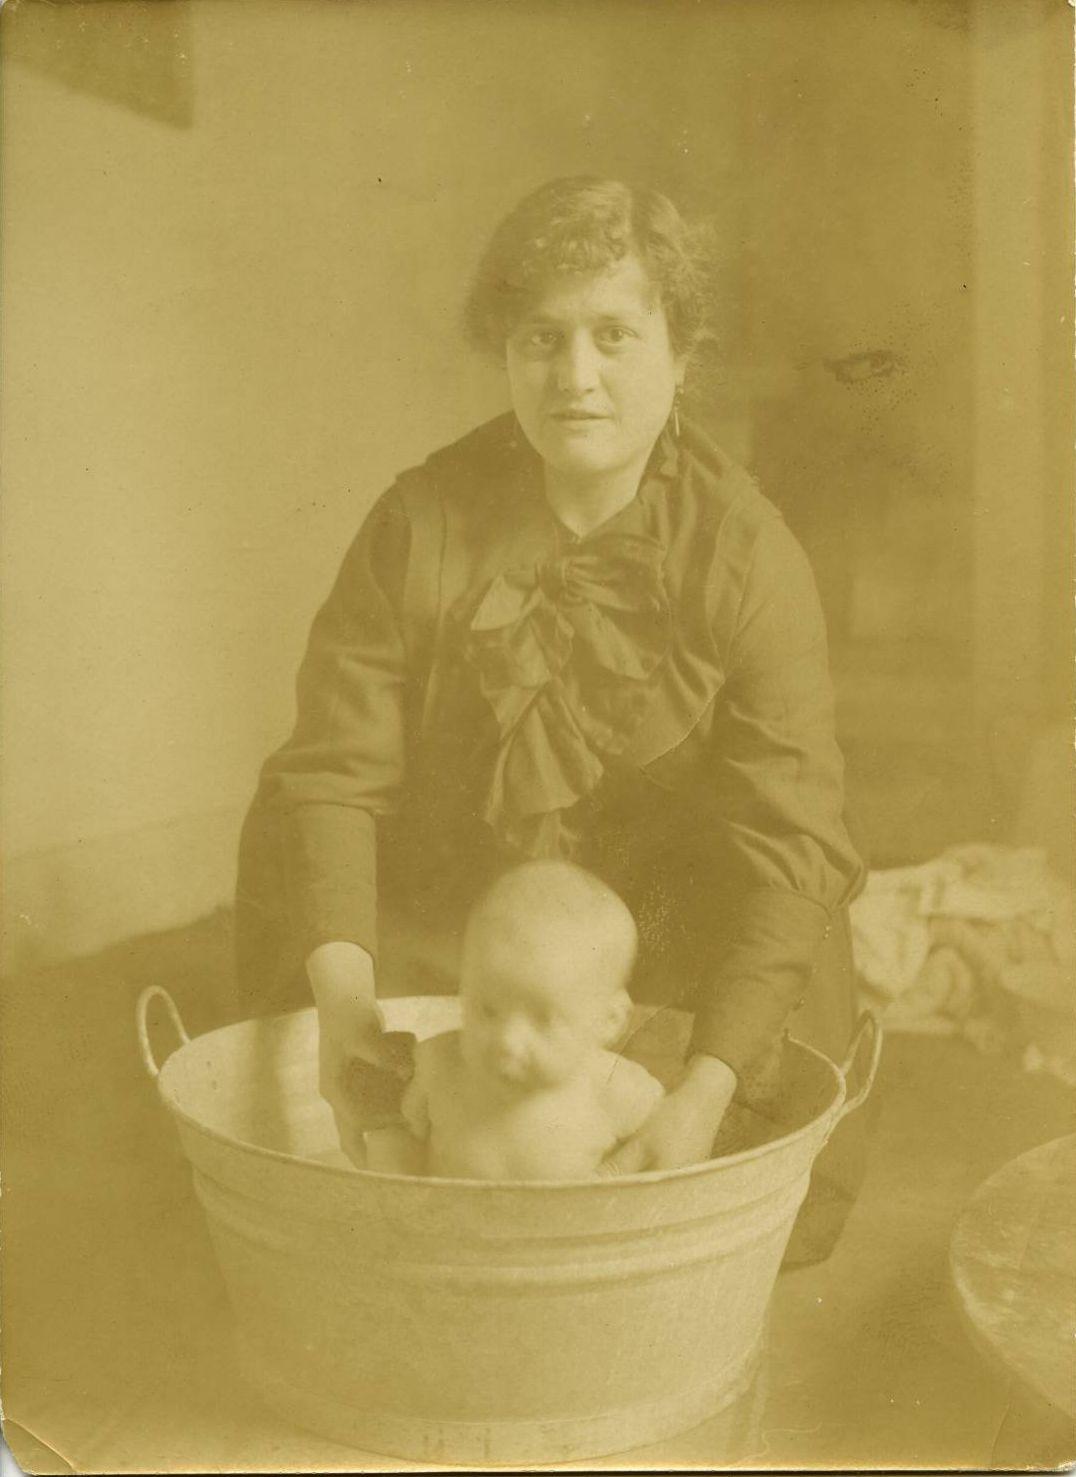 t.-La hija del pintor bañada por su tía Juana Arjona 1918